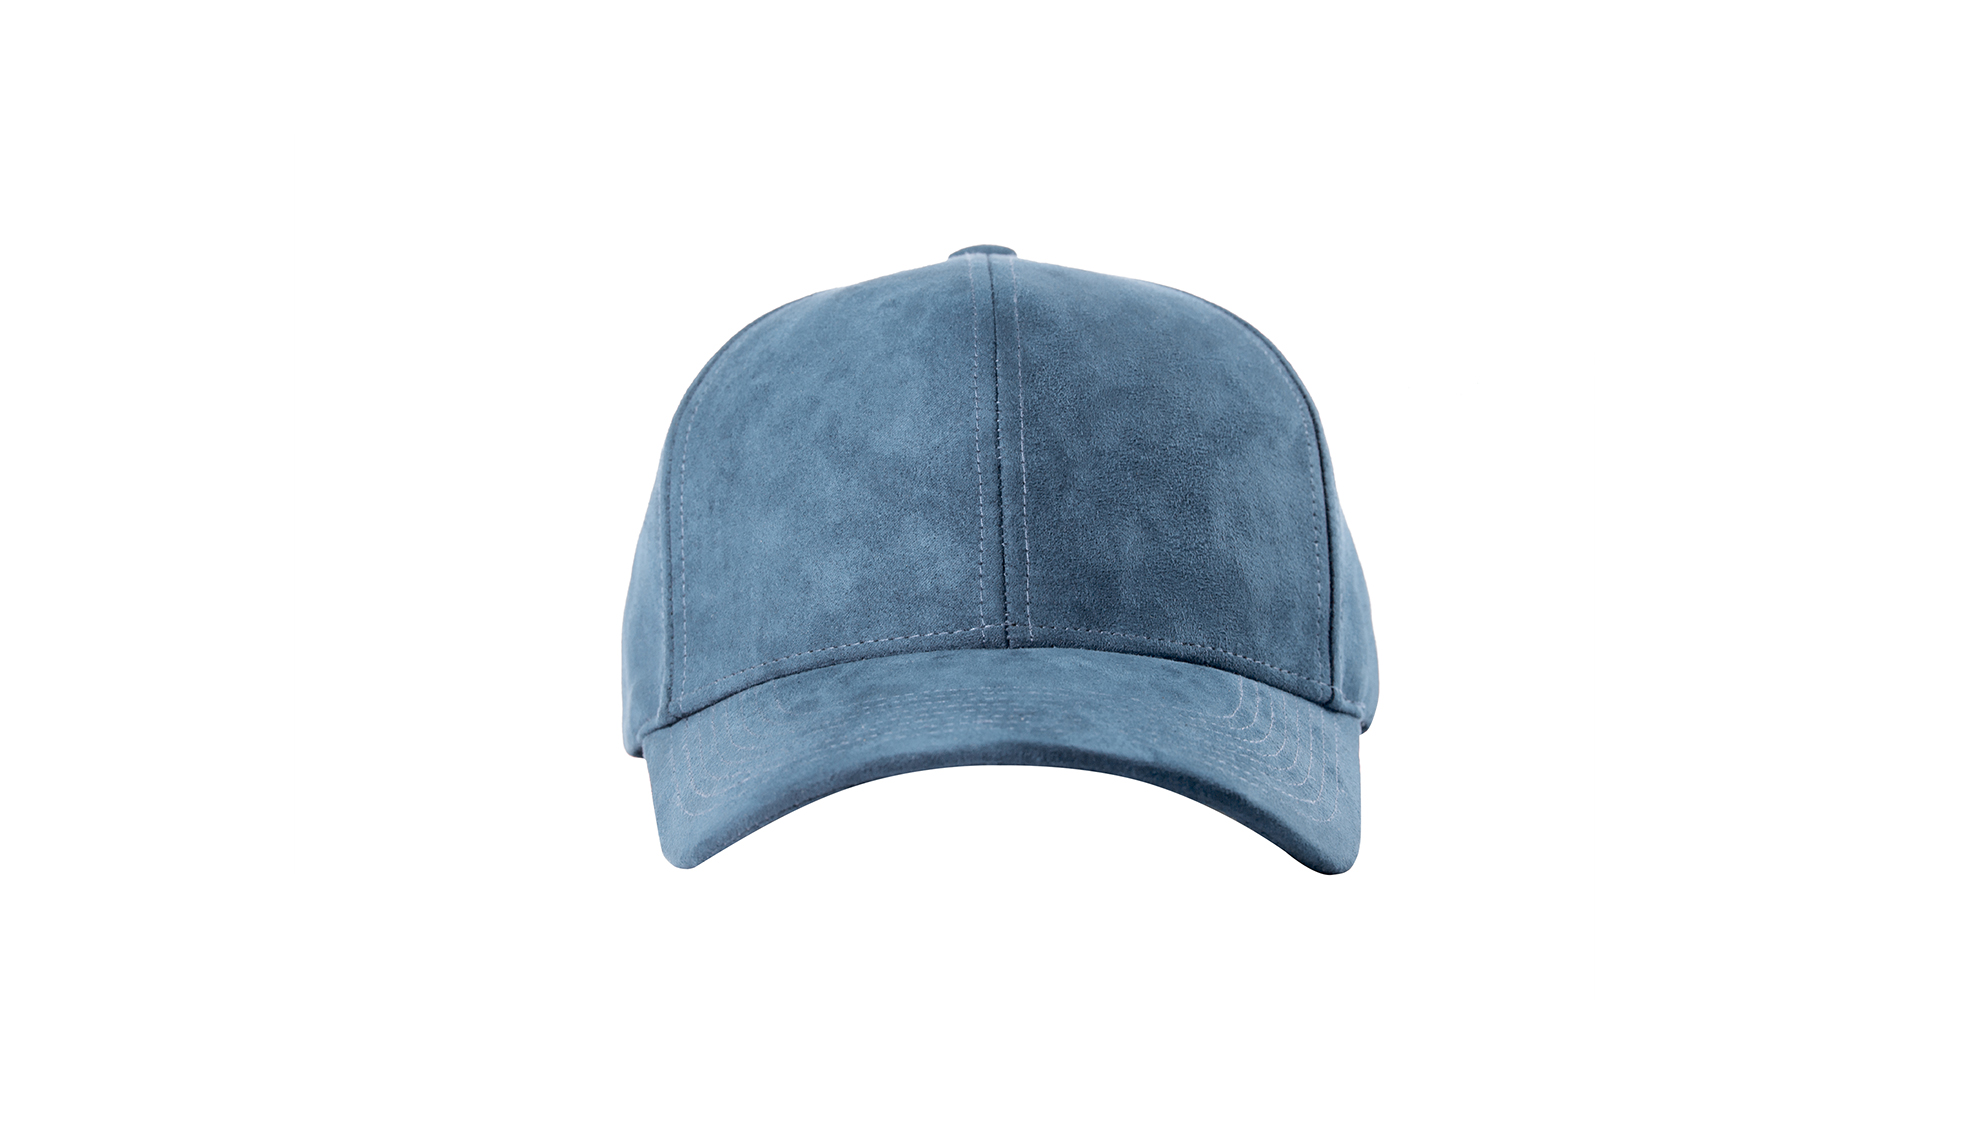 DSLINE BASEBALL CAP SKY BLUE SUEDE   SILVER - DSLINE BASICS 57522c5c319